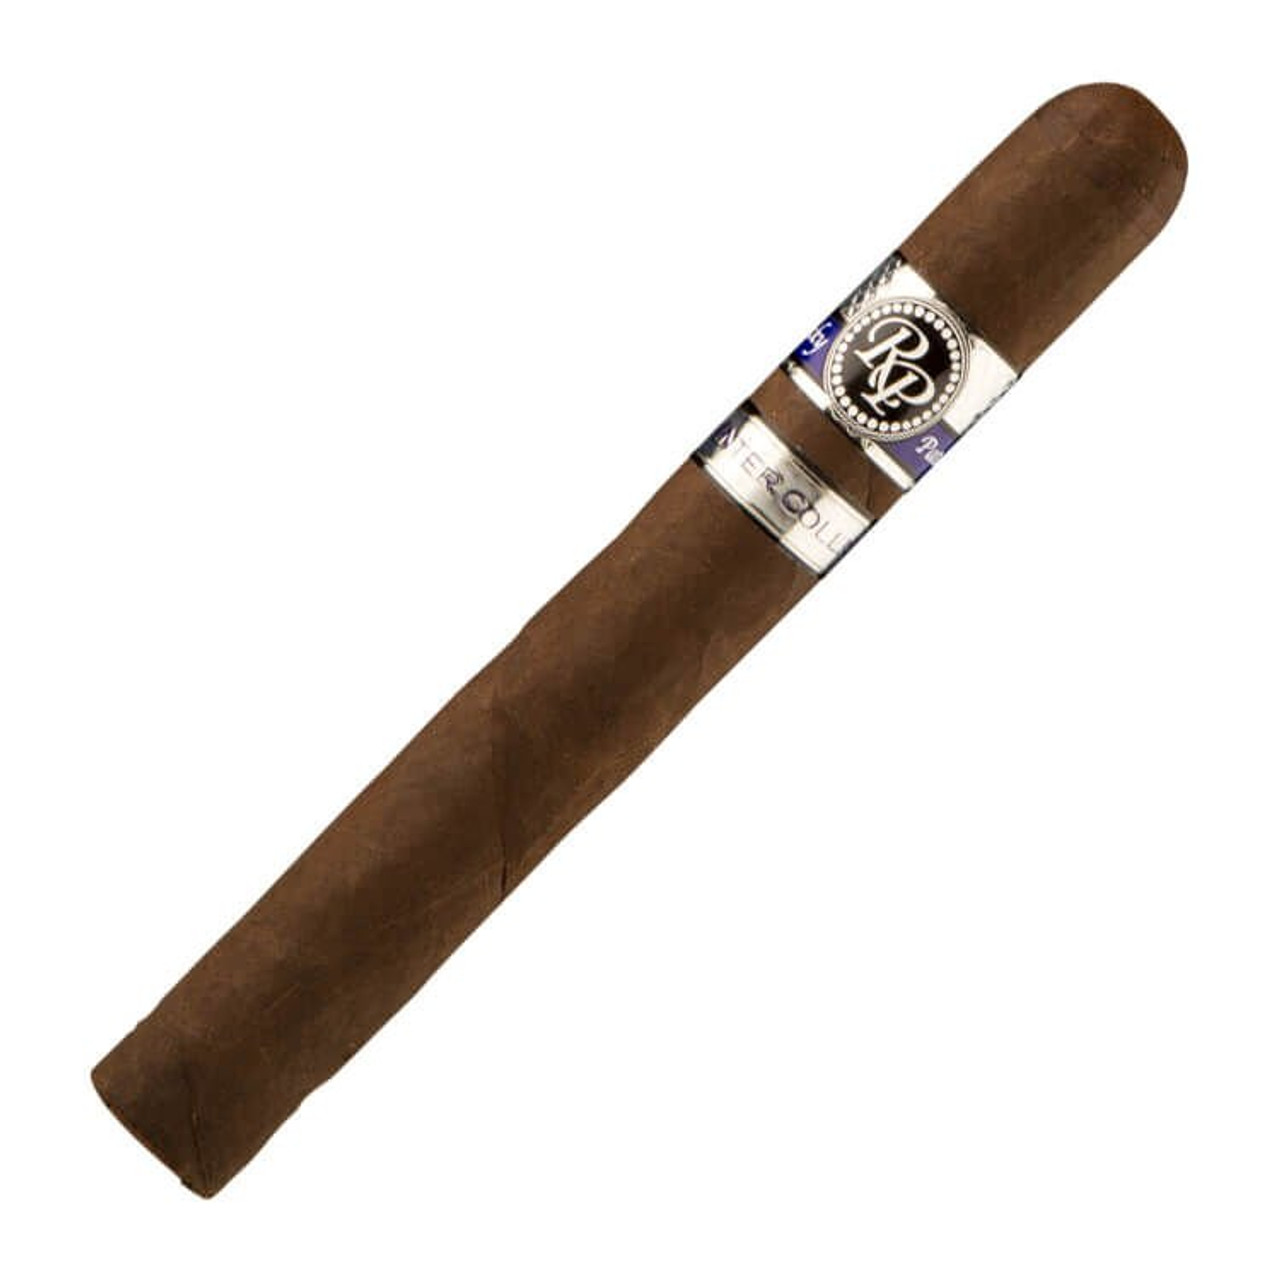 Rocky Patel Winter Collection Toro Cigars - 6.5 x 52 (Box of 20)